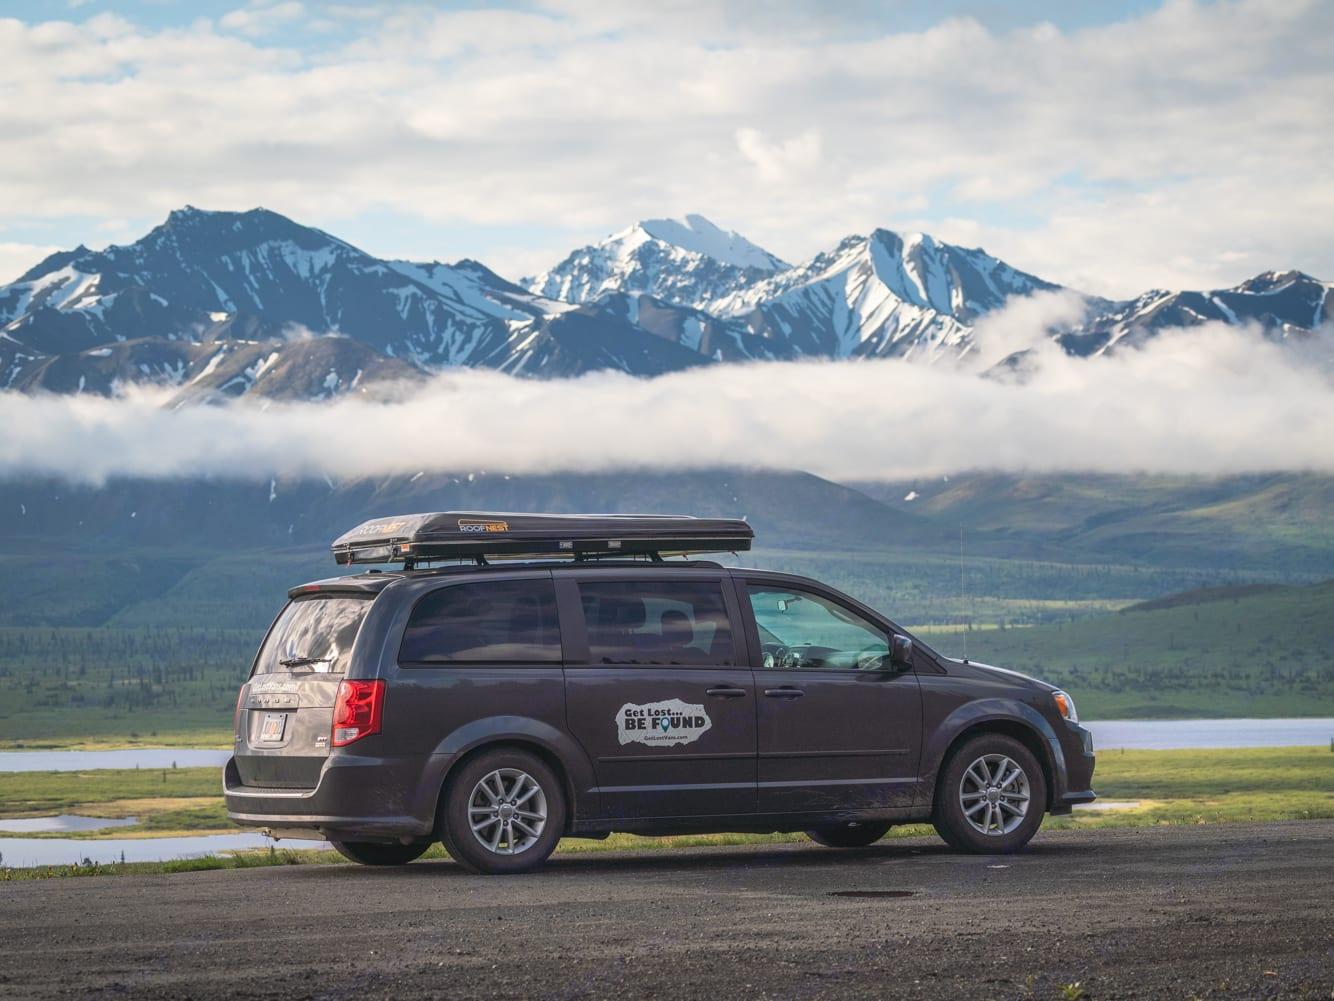 Get Lost Travel Van Ready to Drive. Dodge Grand Caravan 2016